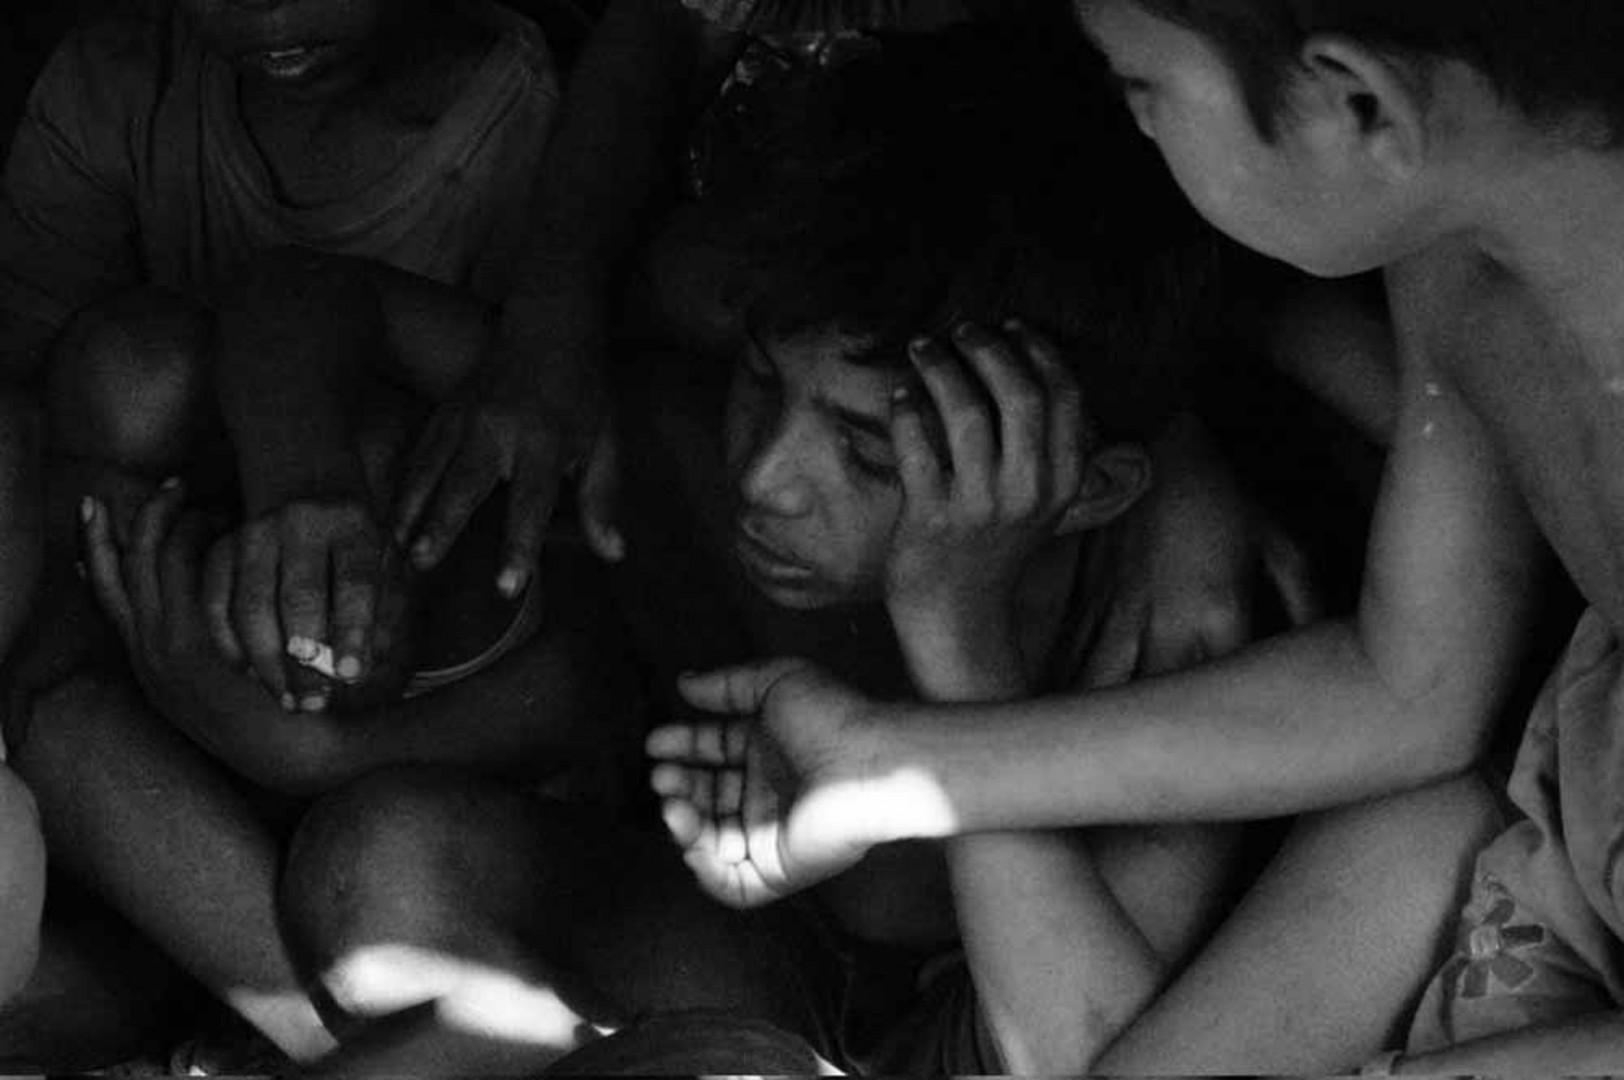 Guerra della droga in Bangladesh (LaPresse)